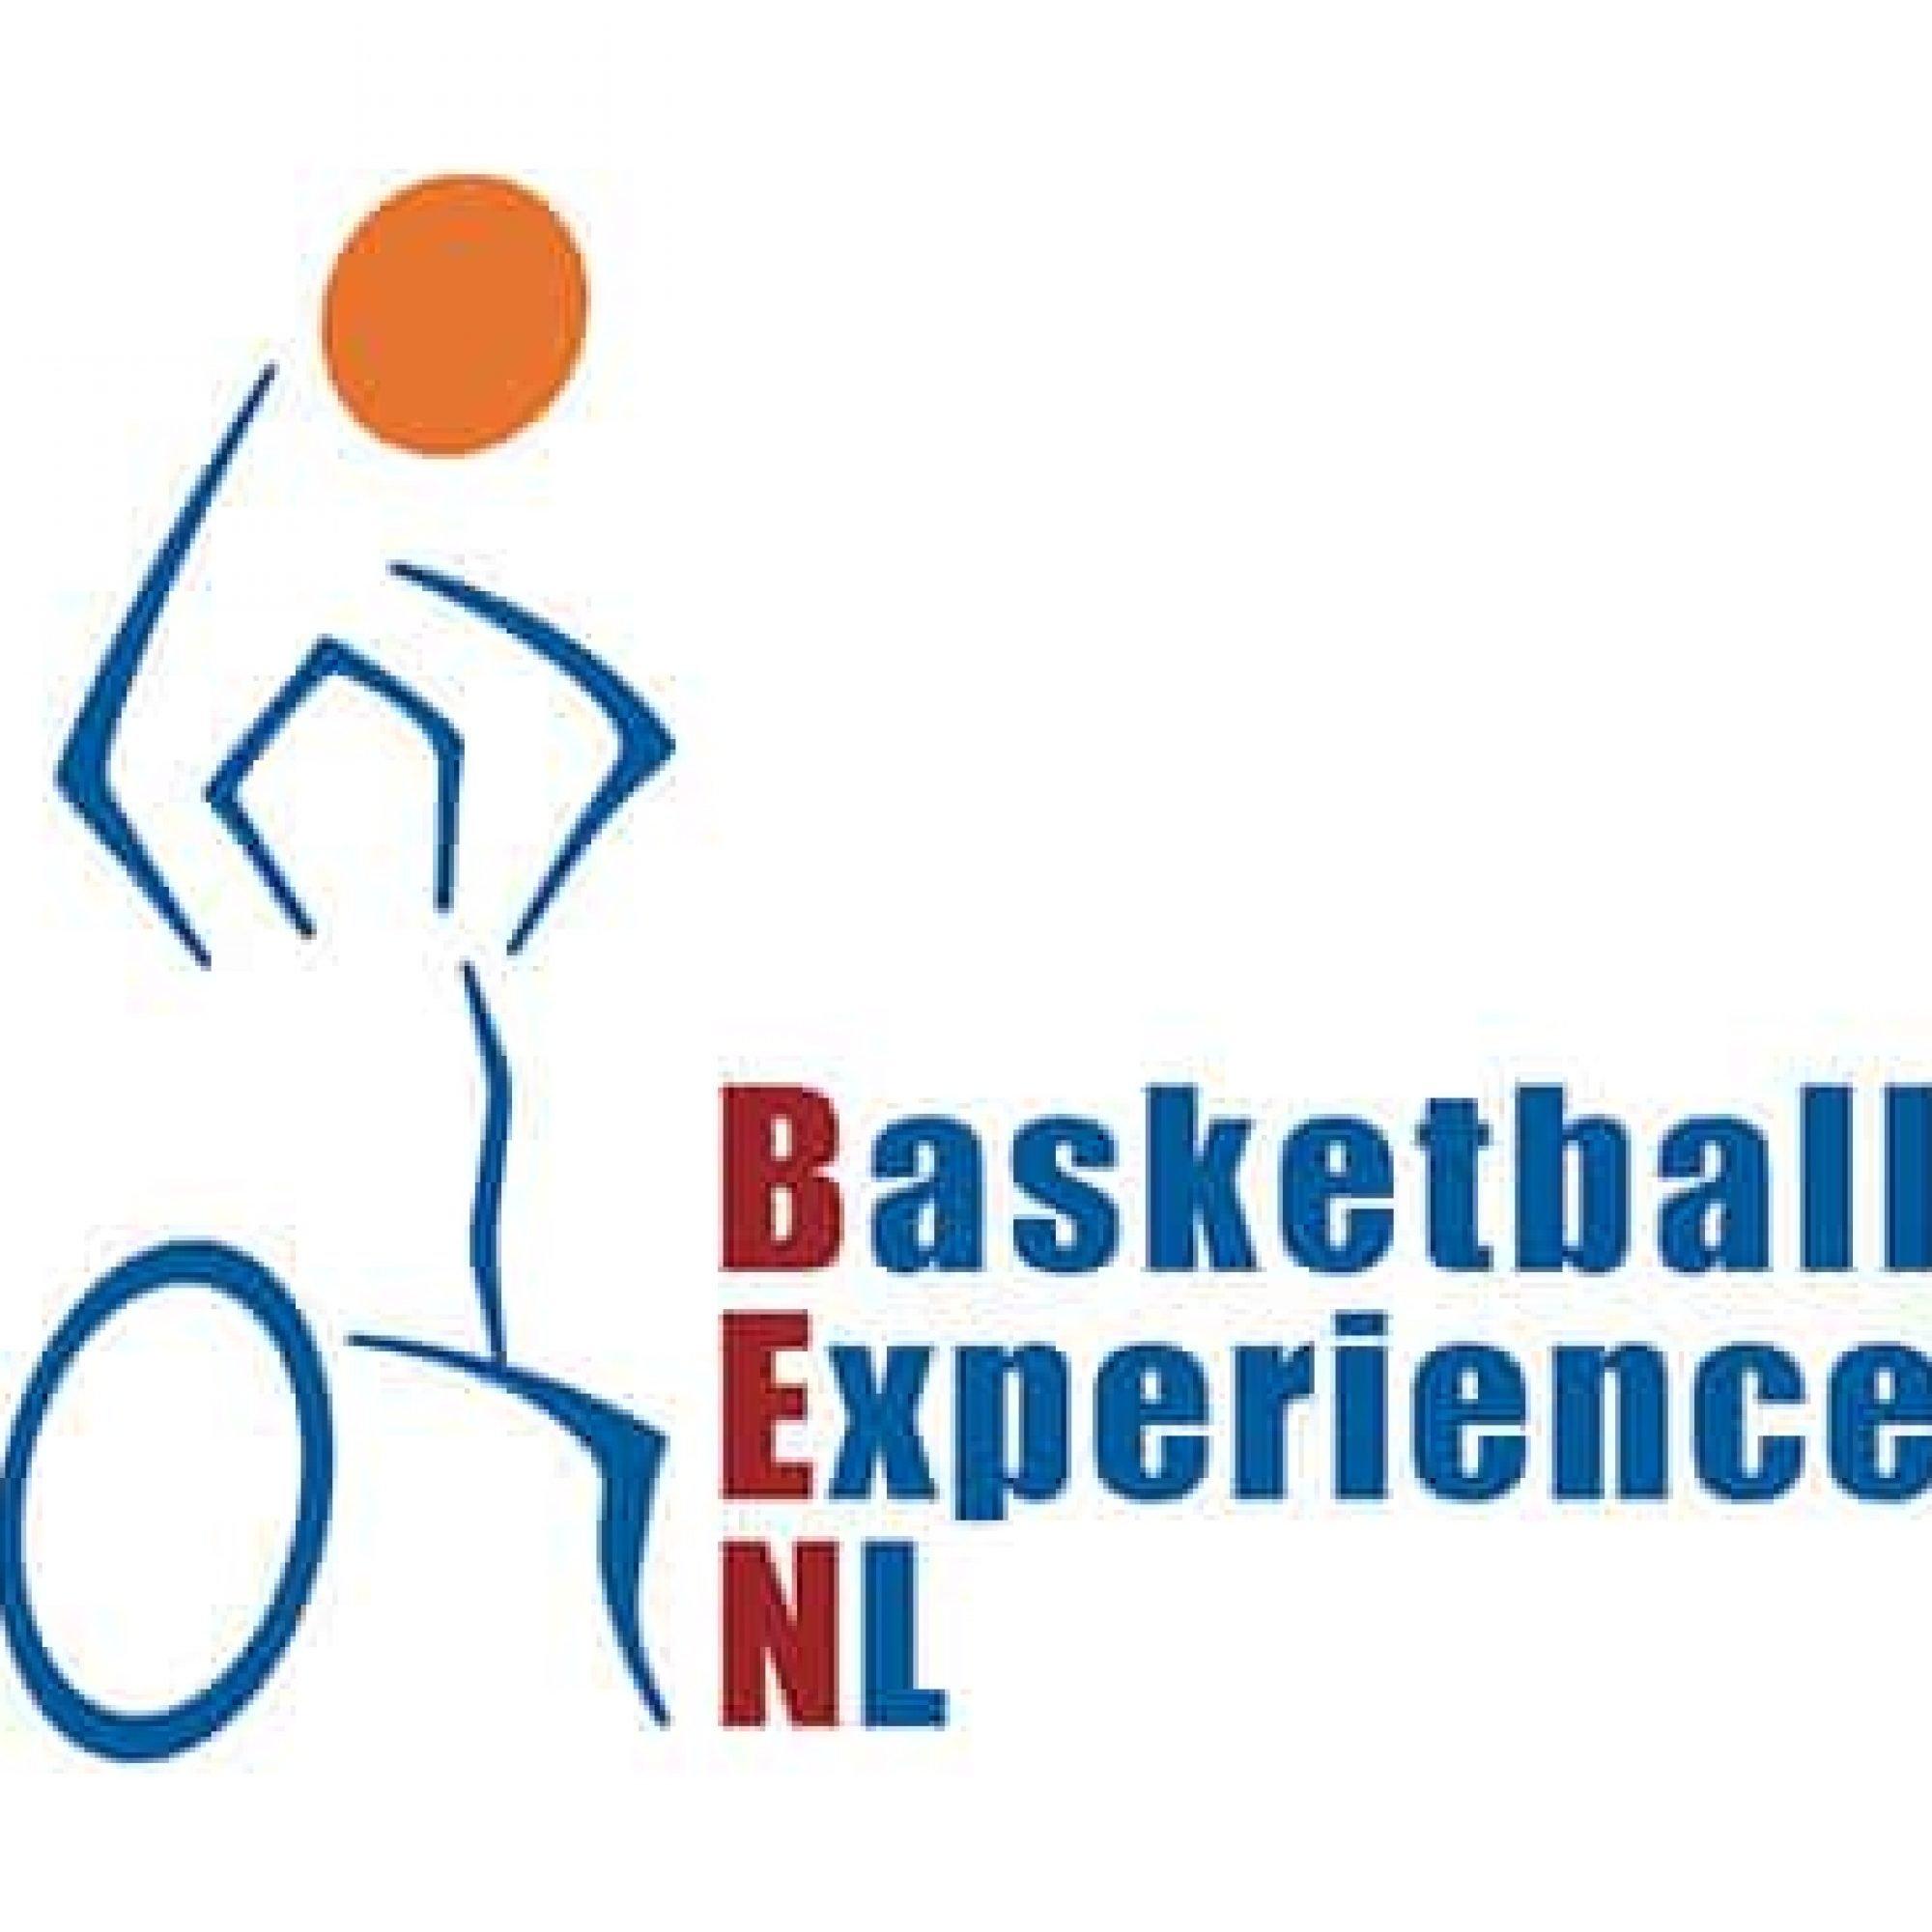 logo_ek_ben.jpg